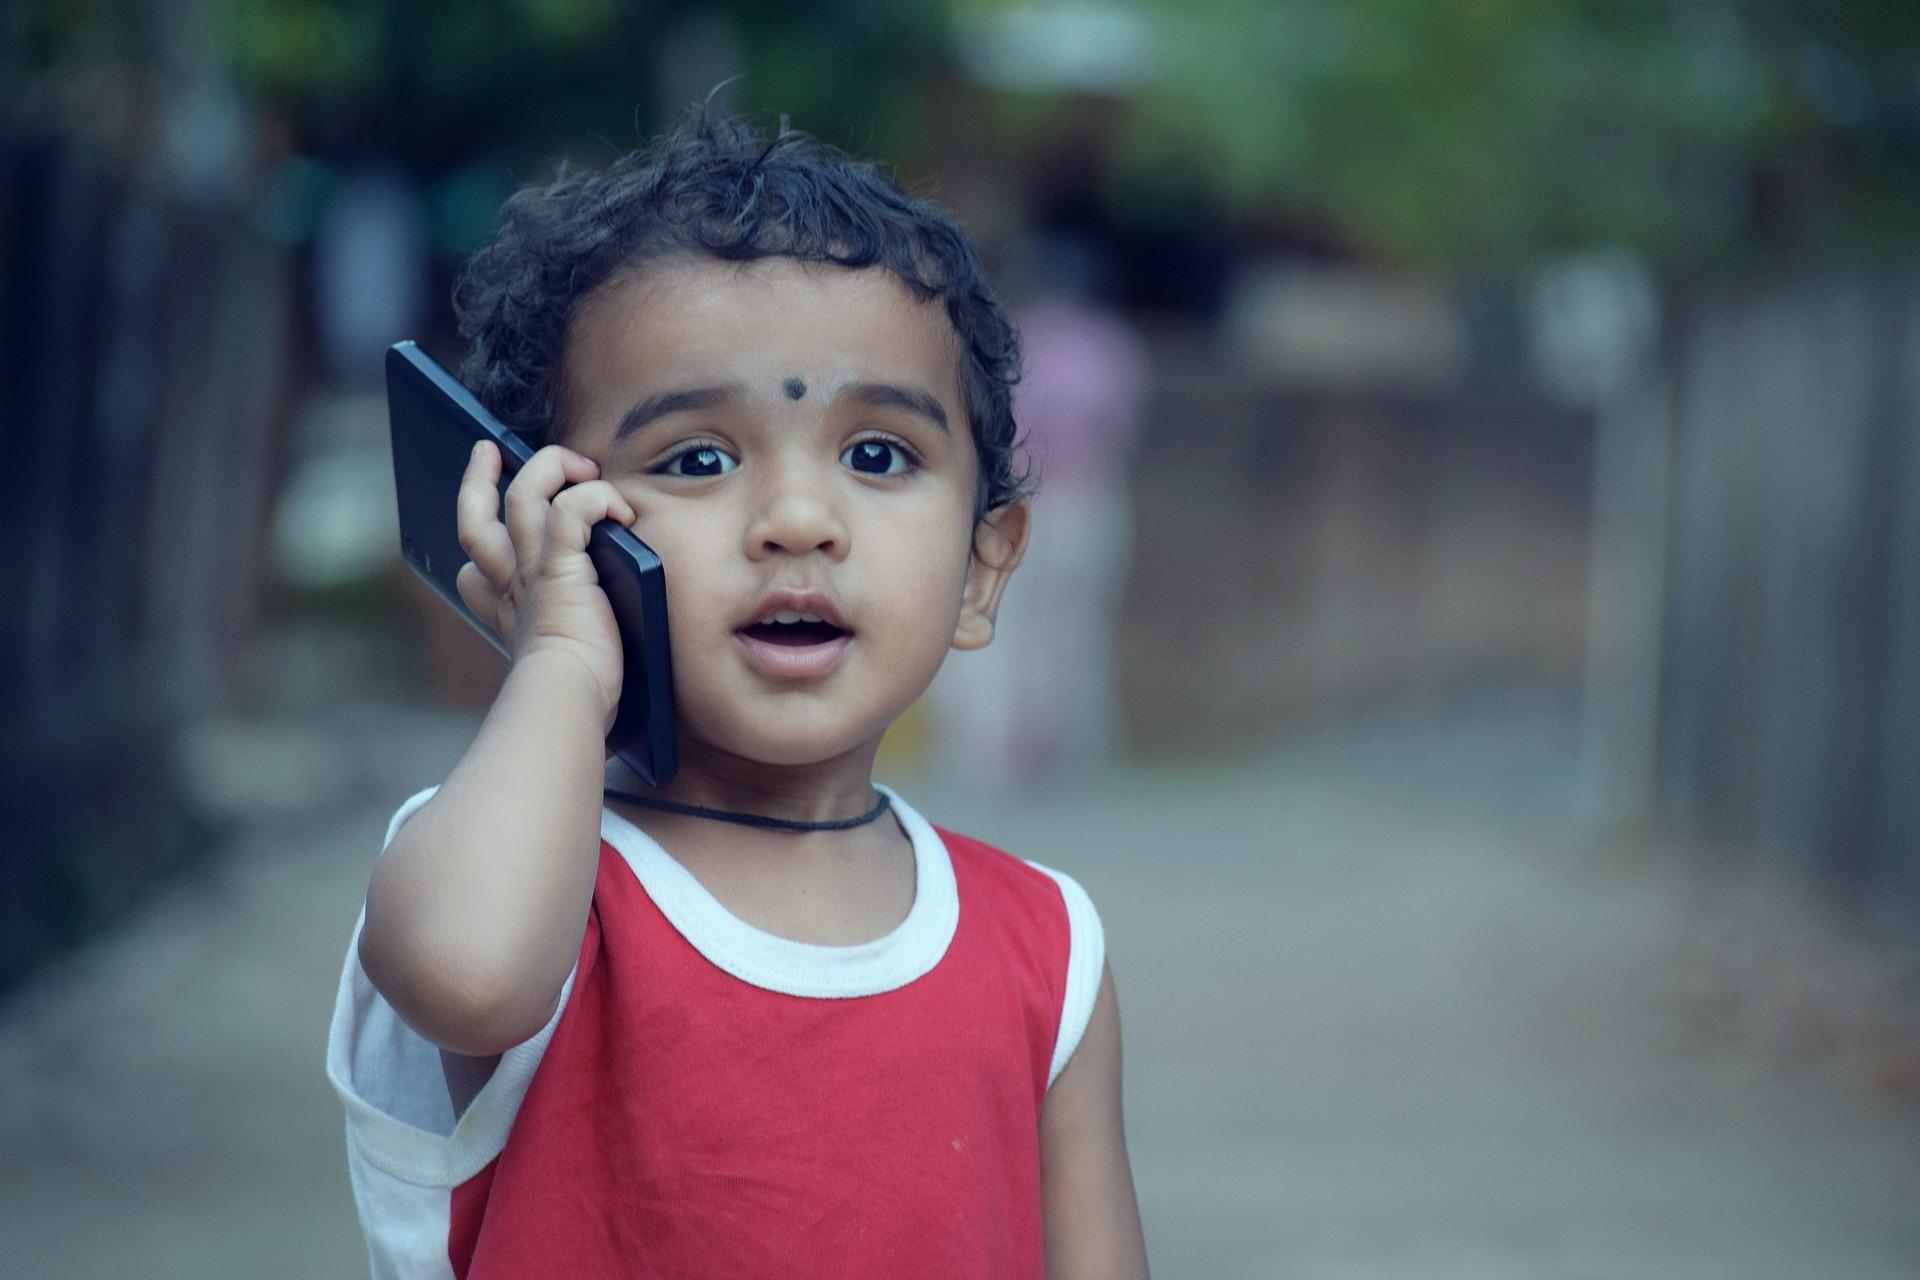 enfant telephone